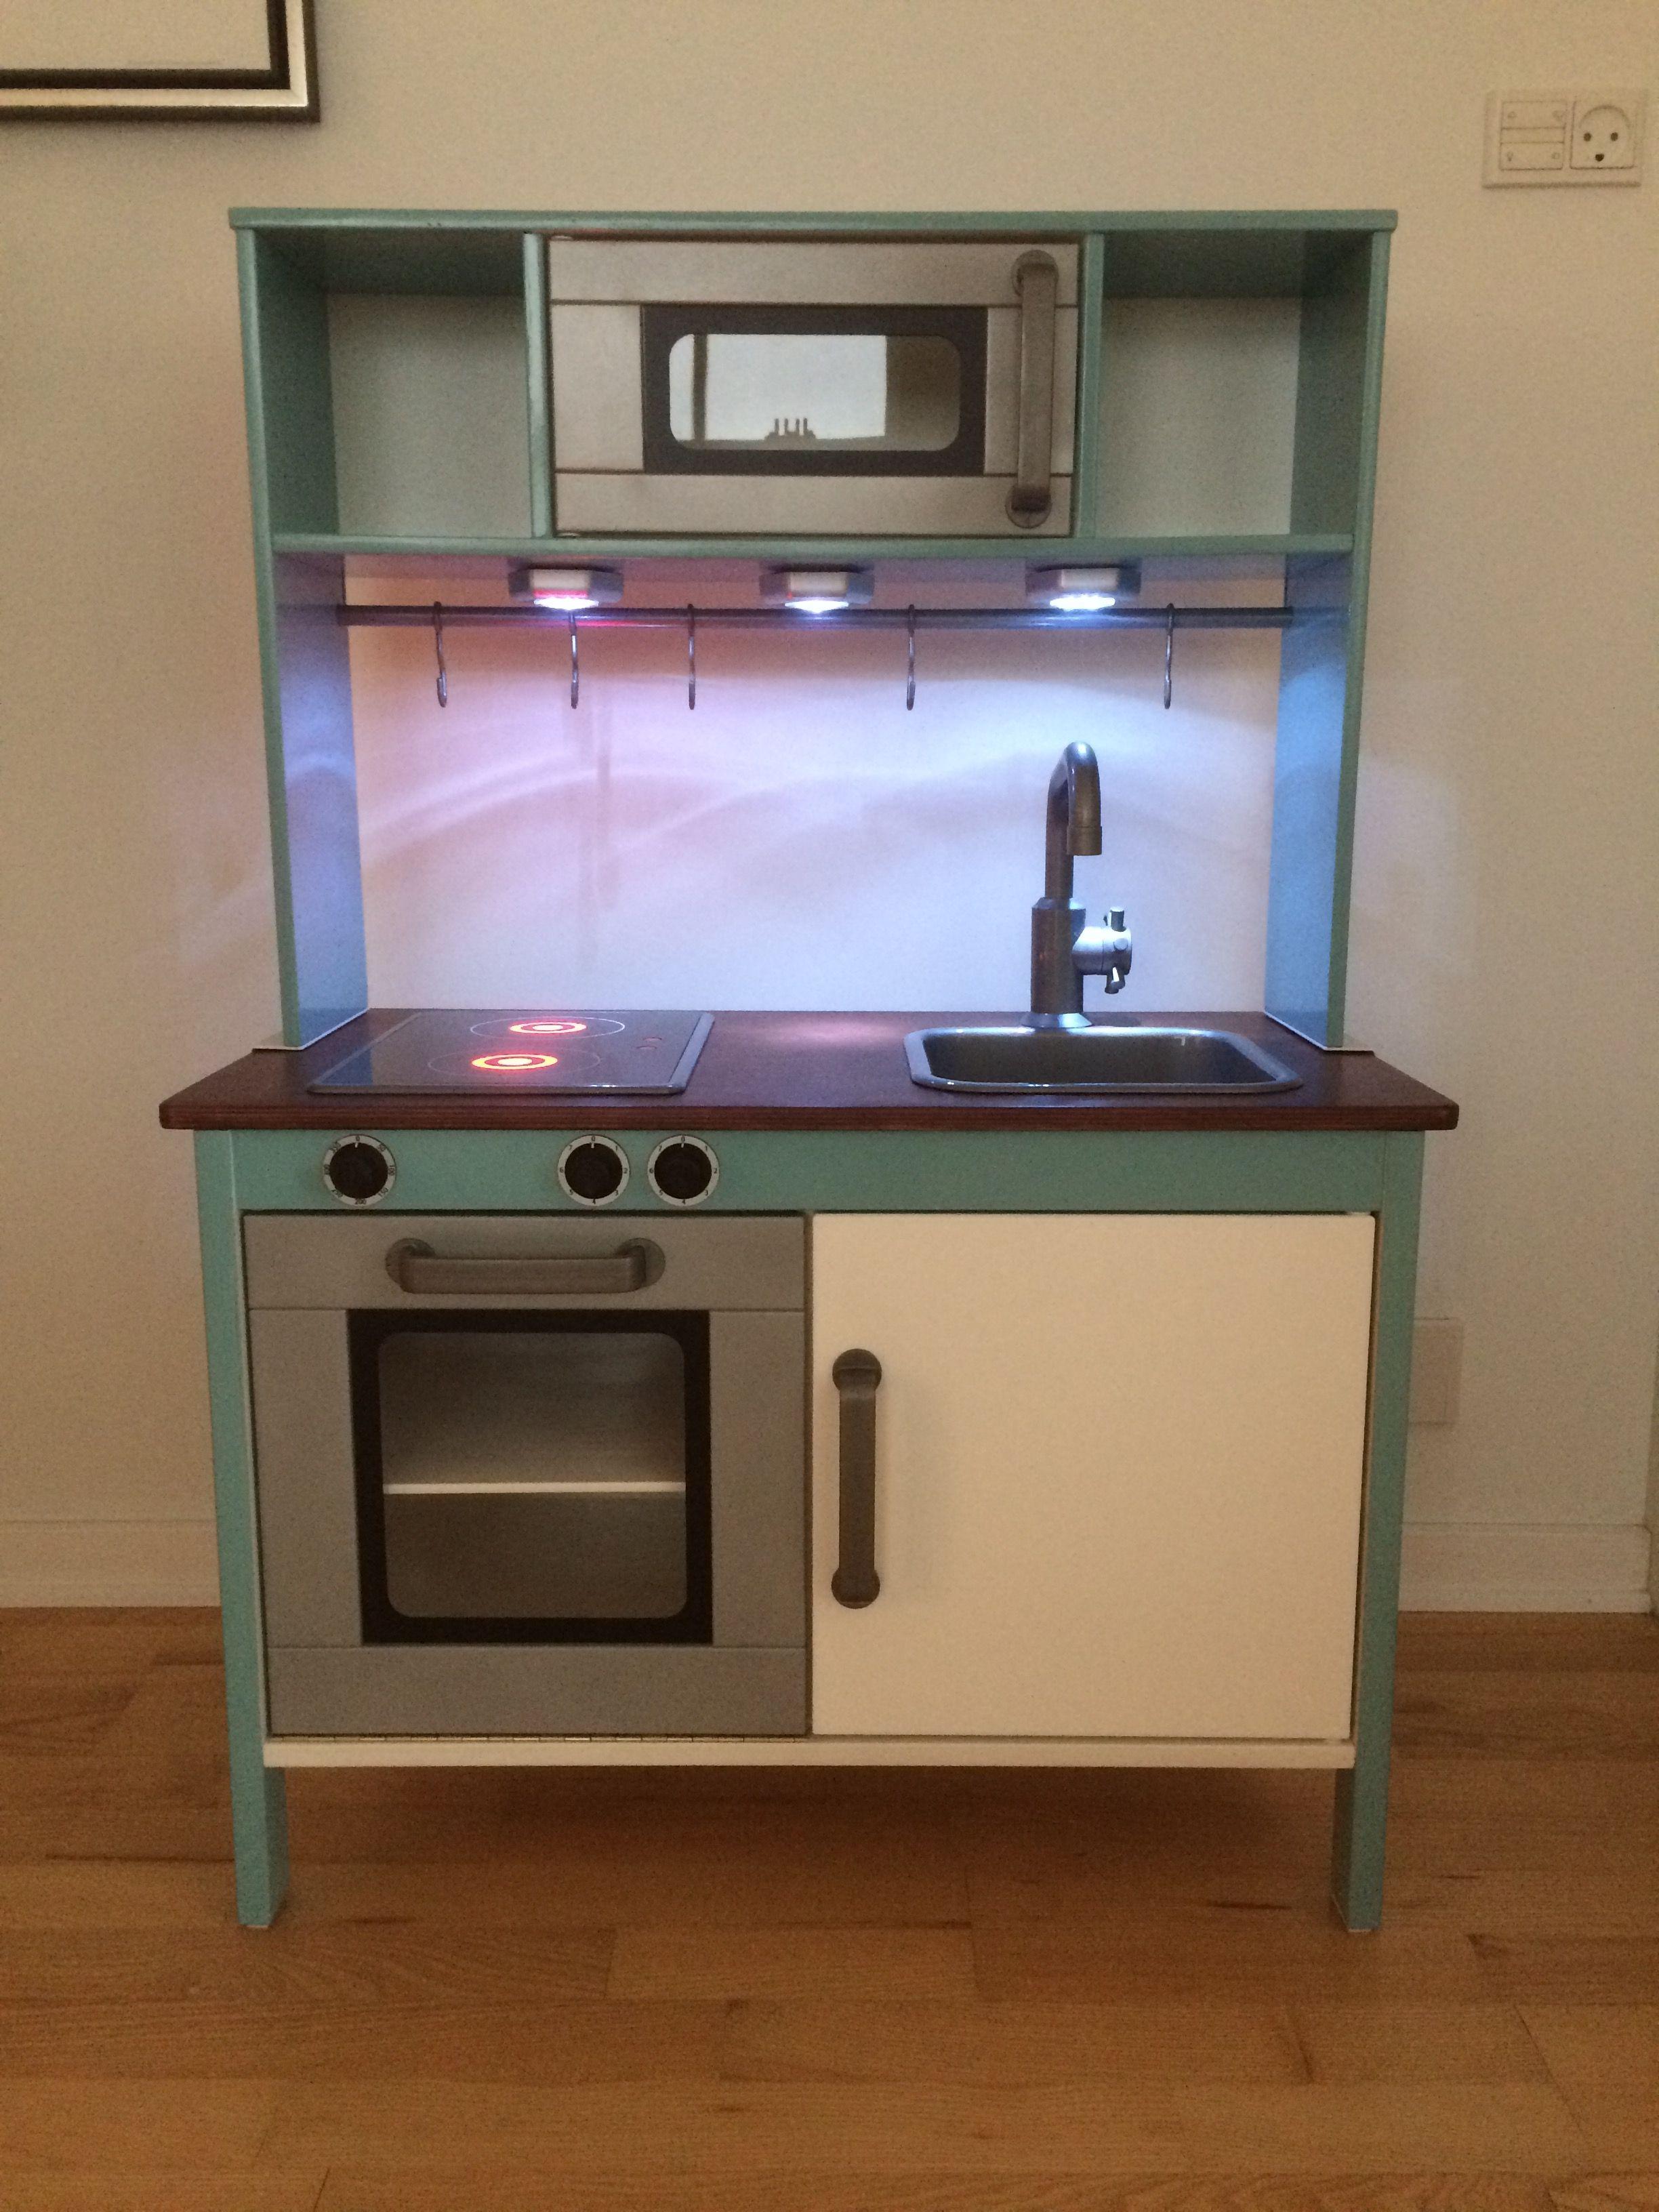 ikea duktig kitchen diy for our son august christmas 2014 bunny pinterest. Black Bedroom Furniture Sets. Home Design Ideas